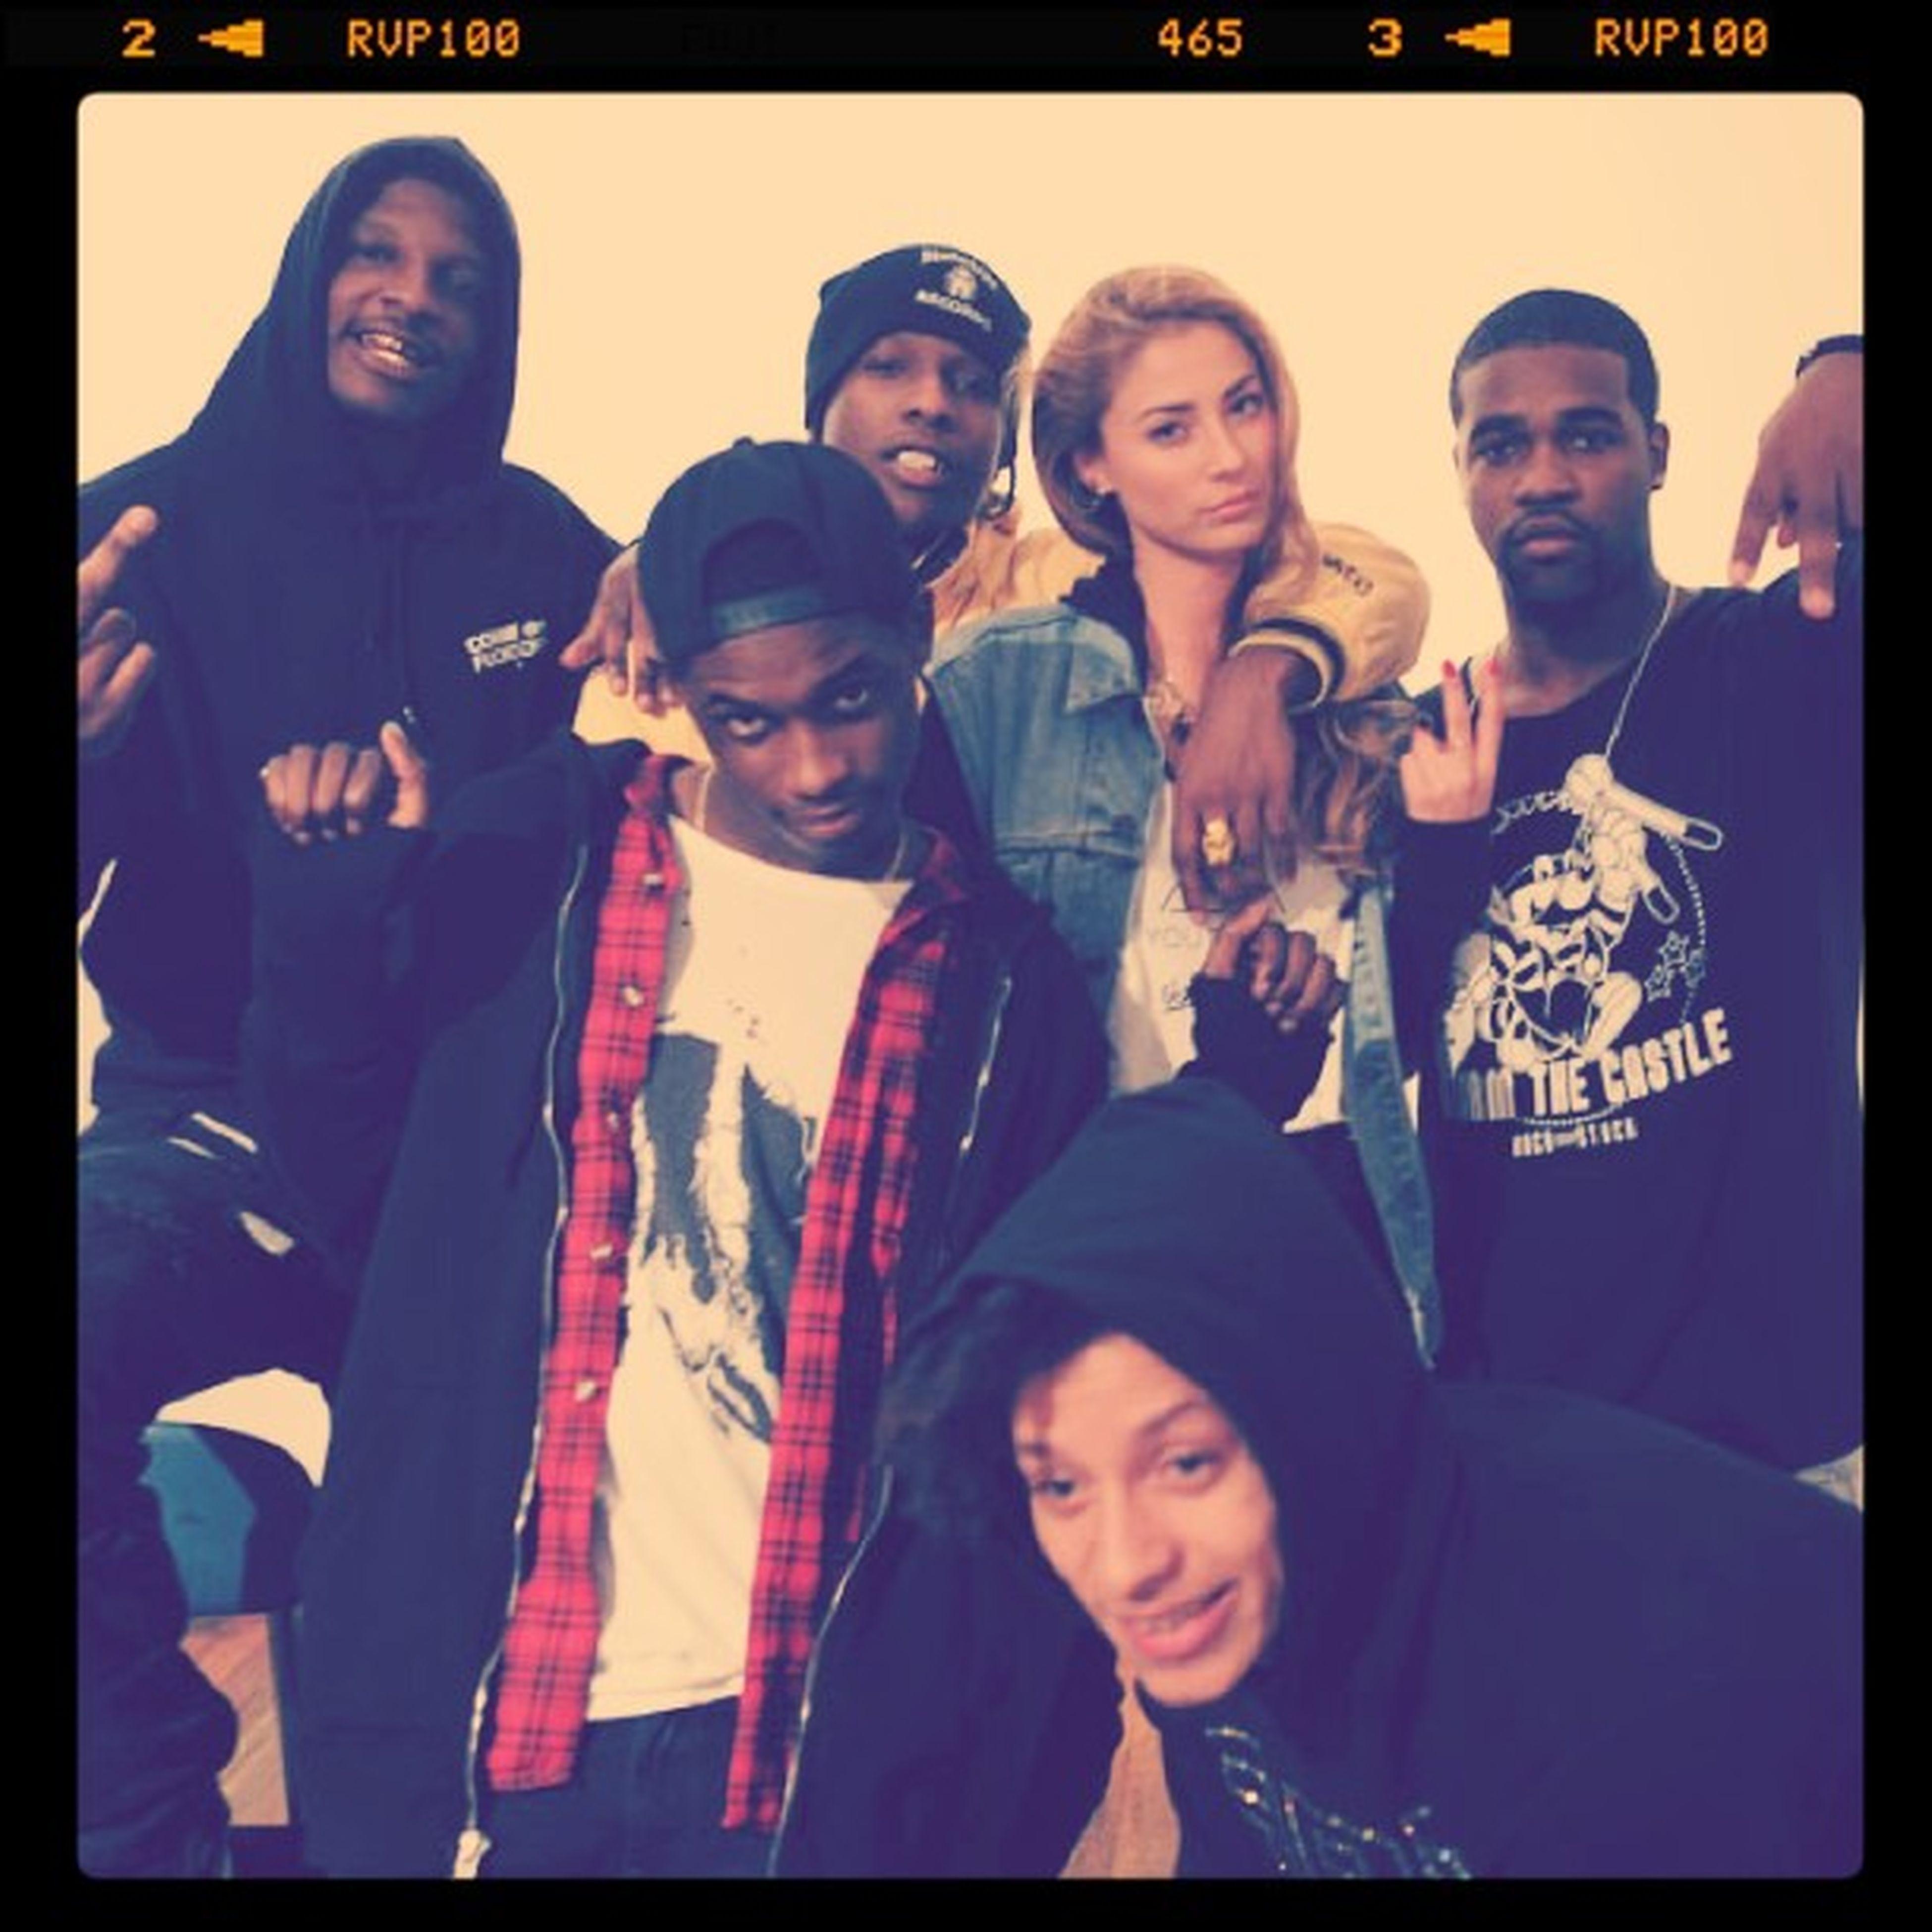 MakingOffVideoShoot AYS x asaprocky #prettymotherfuckers #crew #the88 #artyouthsociety #staygold with asap_relli asvpillz asvpxrocky #prettyflacko Crew Asaprocky Artyouthsociety Staygold Prettymotherfuckers The88 Prettyflacko